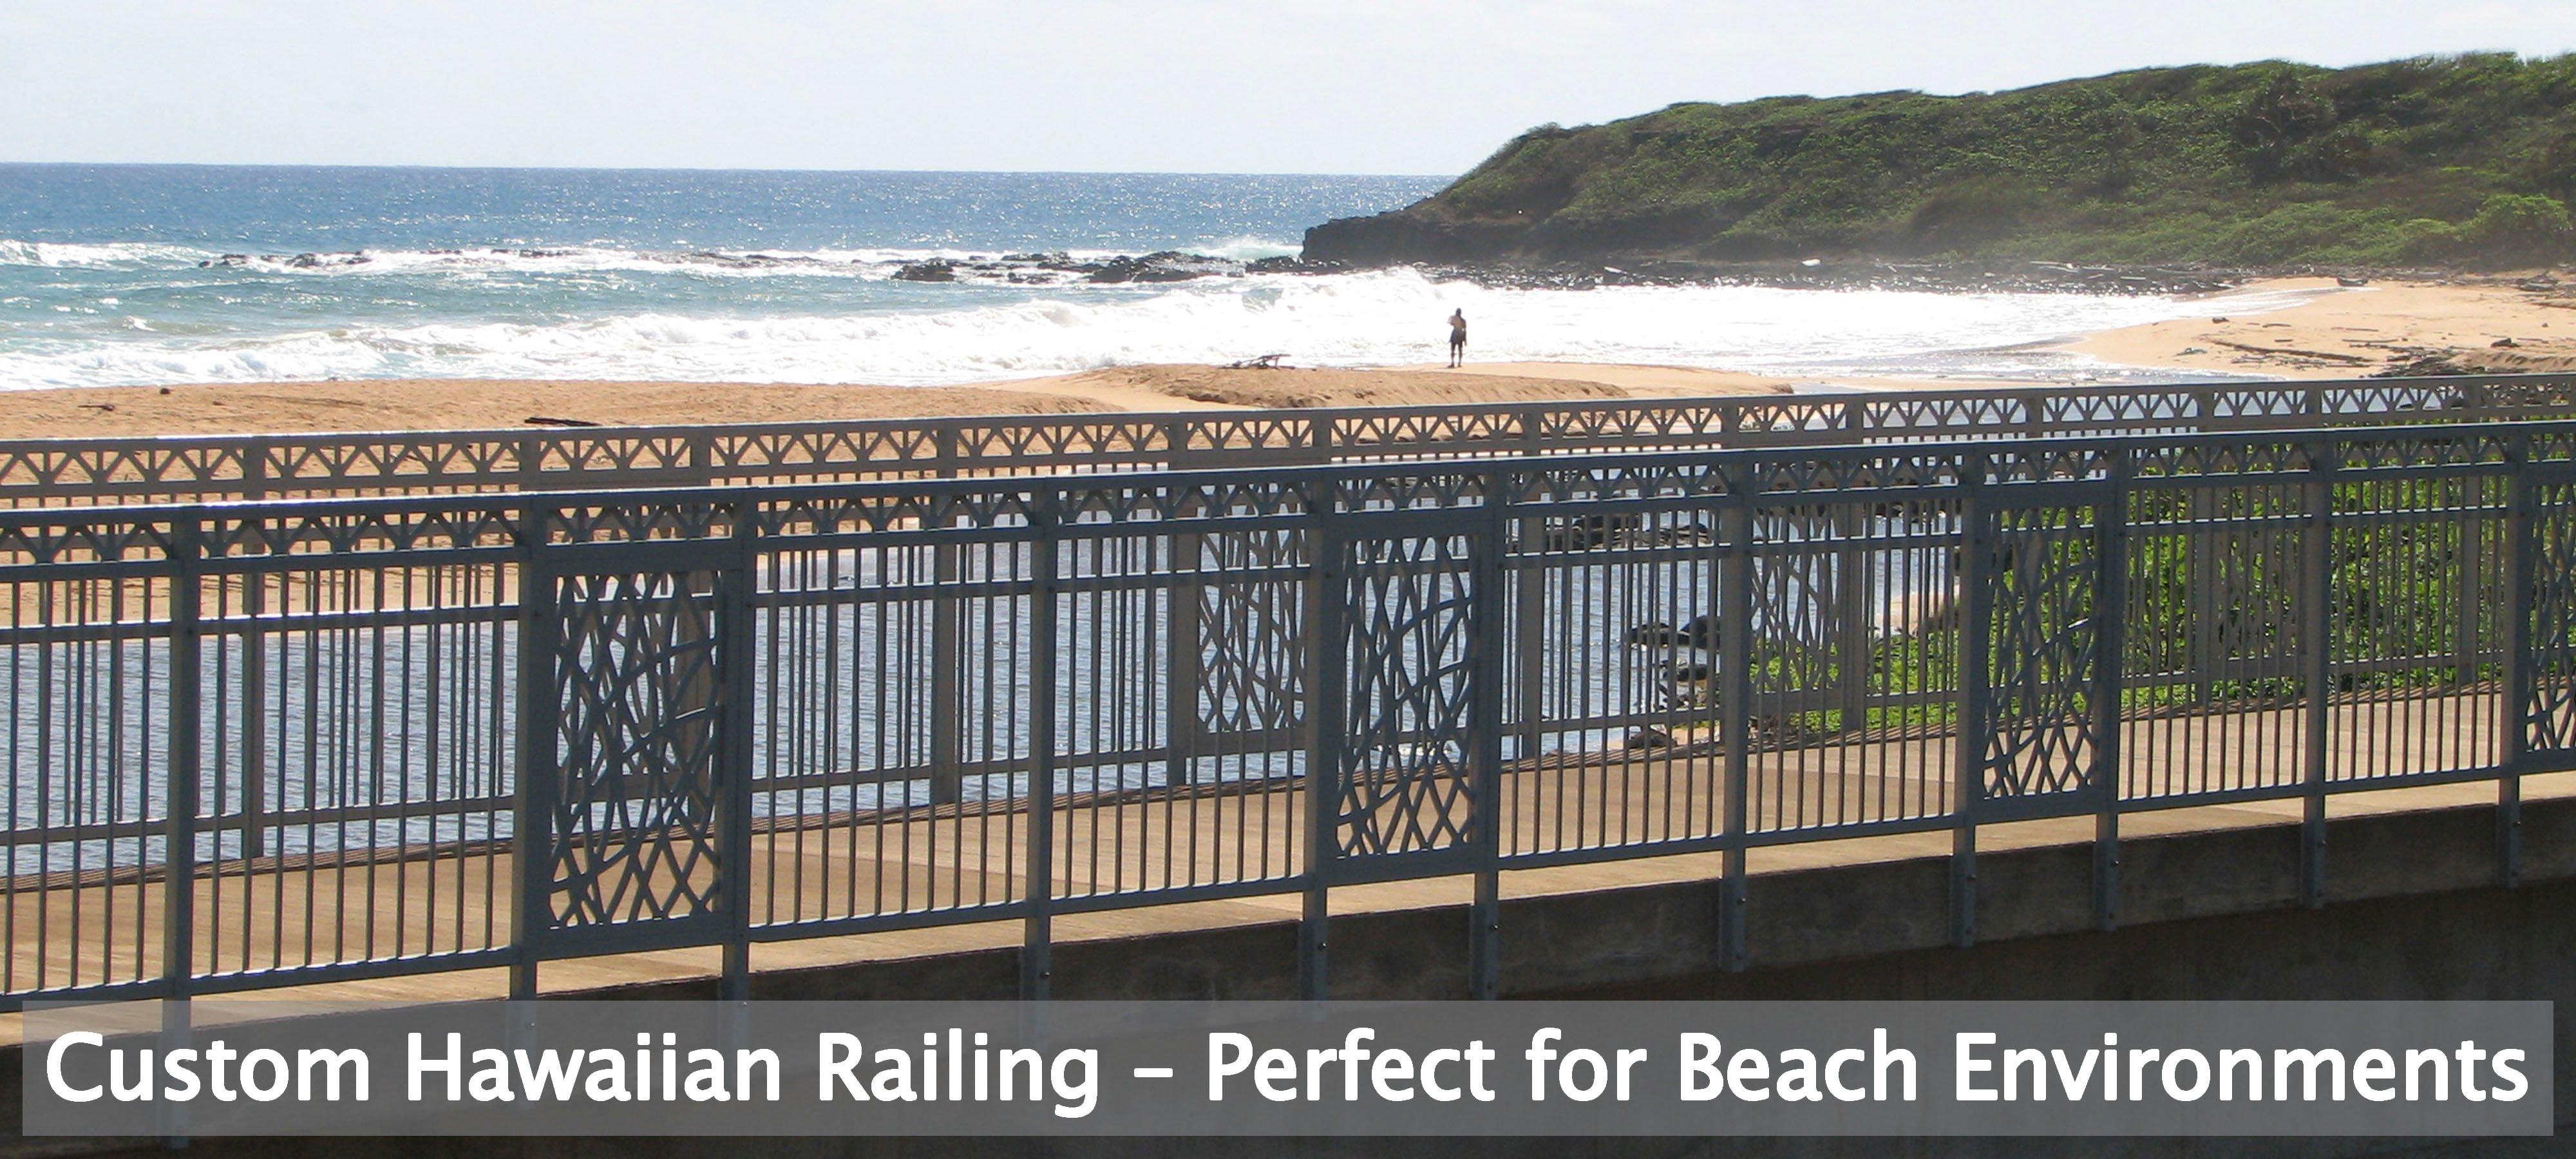 Custom-Hawaiian-Railing-Perfect-for-Beach-Environments.jpg